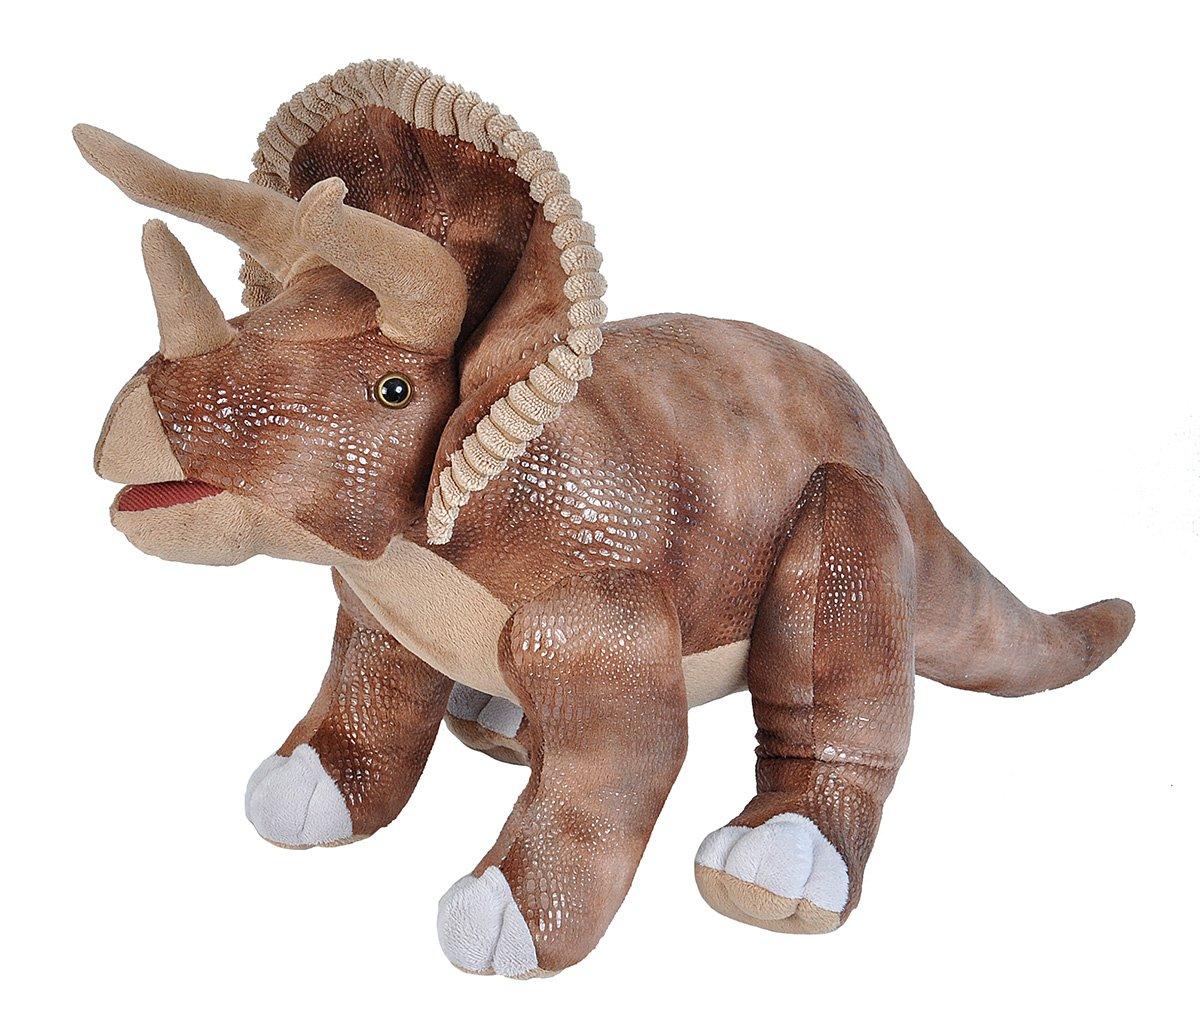 Wild Republic Dinosaurs, Stegosaurus Plush, Dinosaur Stuffed Animal, Plush Toy, Gifts for Kids, 28 inches 22236